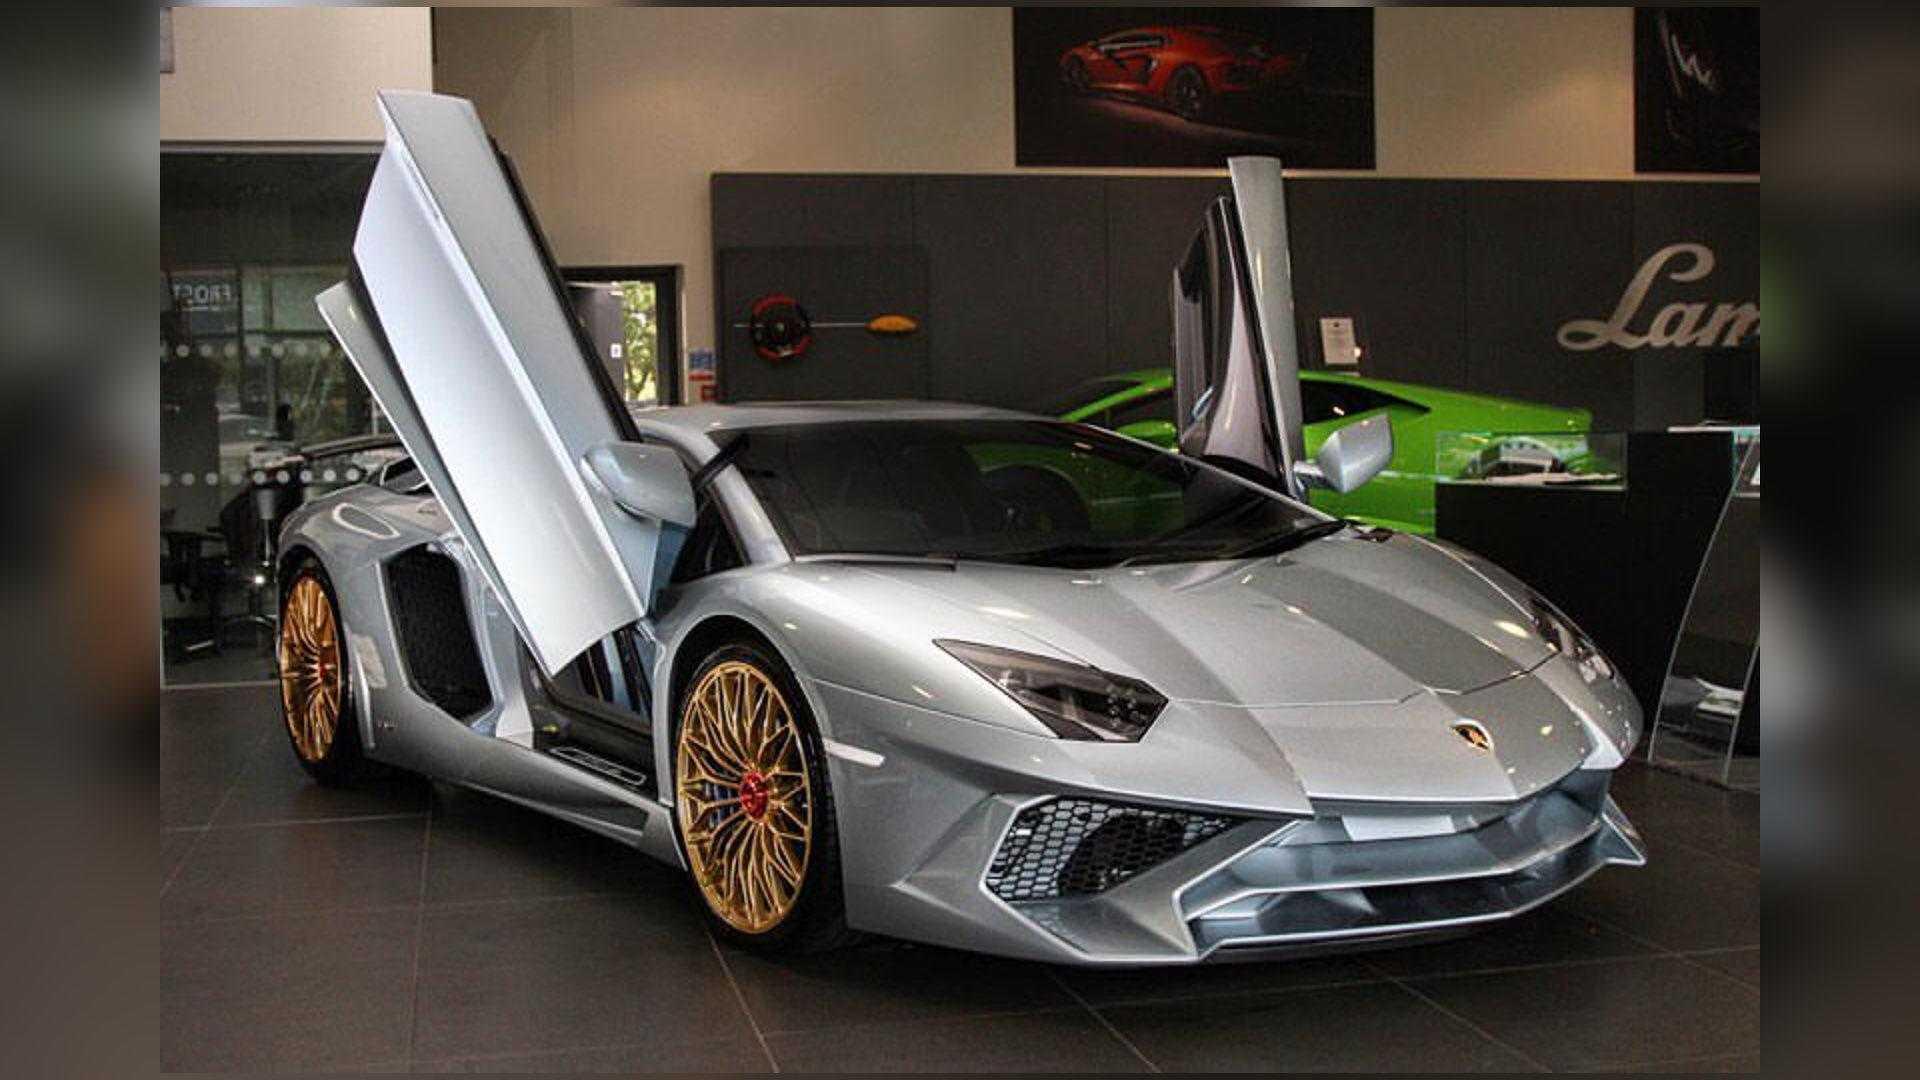 Lamborghini Aventador Spyder >> Final Lamborghini Aventador Sv Gets Porsche 918 Spyder Paint